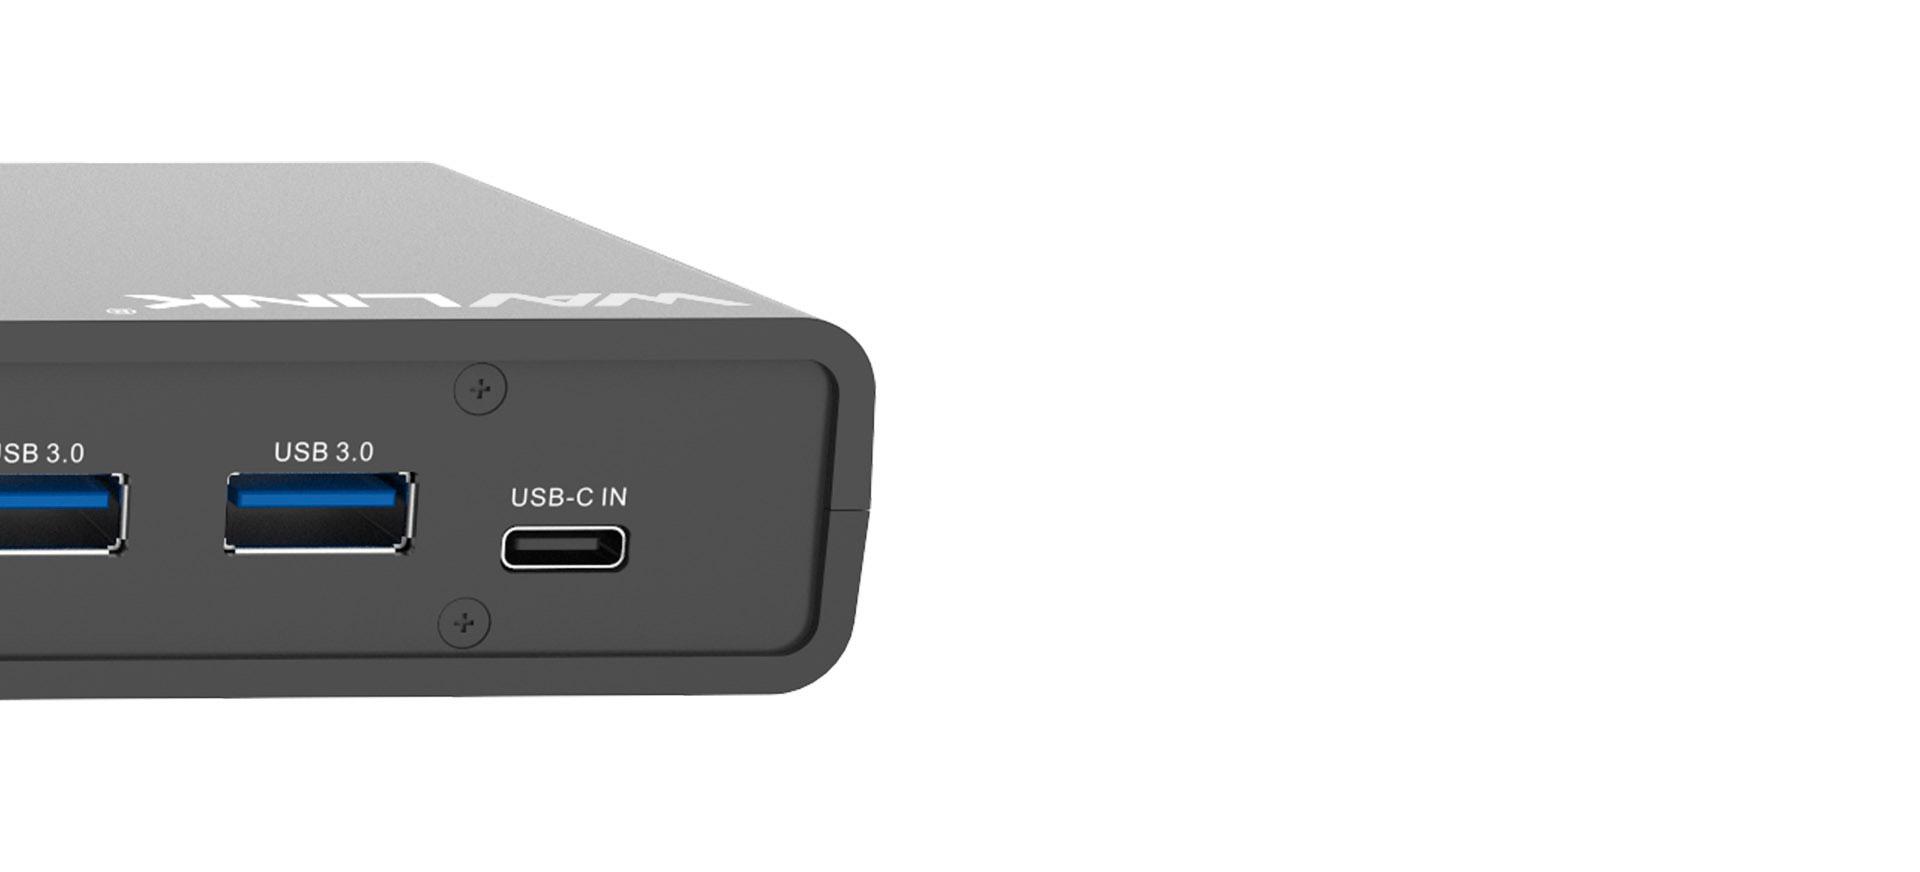 WAVLINK USB UNIVERSAL DOCKING STATION USB-C IN DUAL 4K UG69DK1 6 8